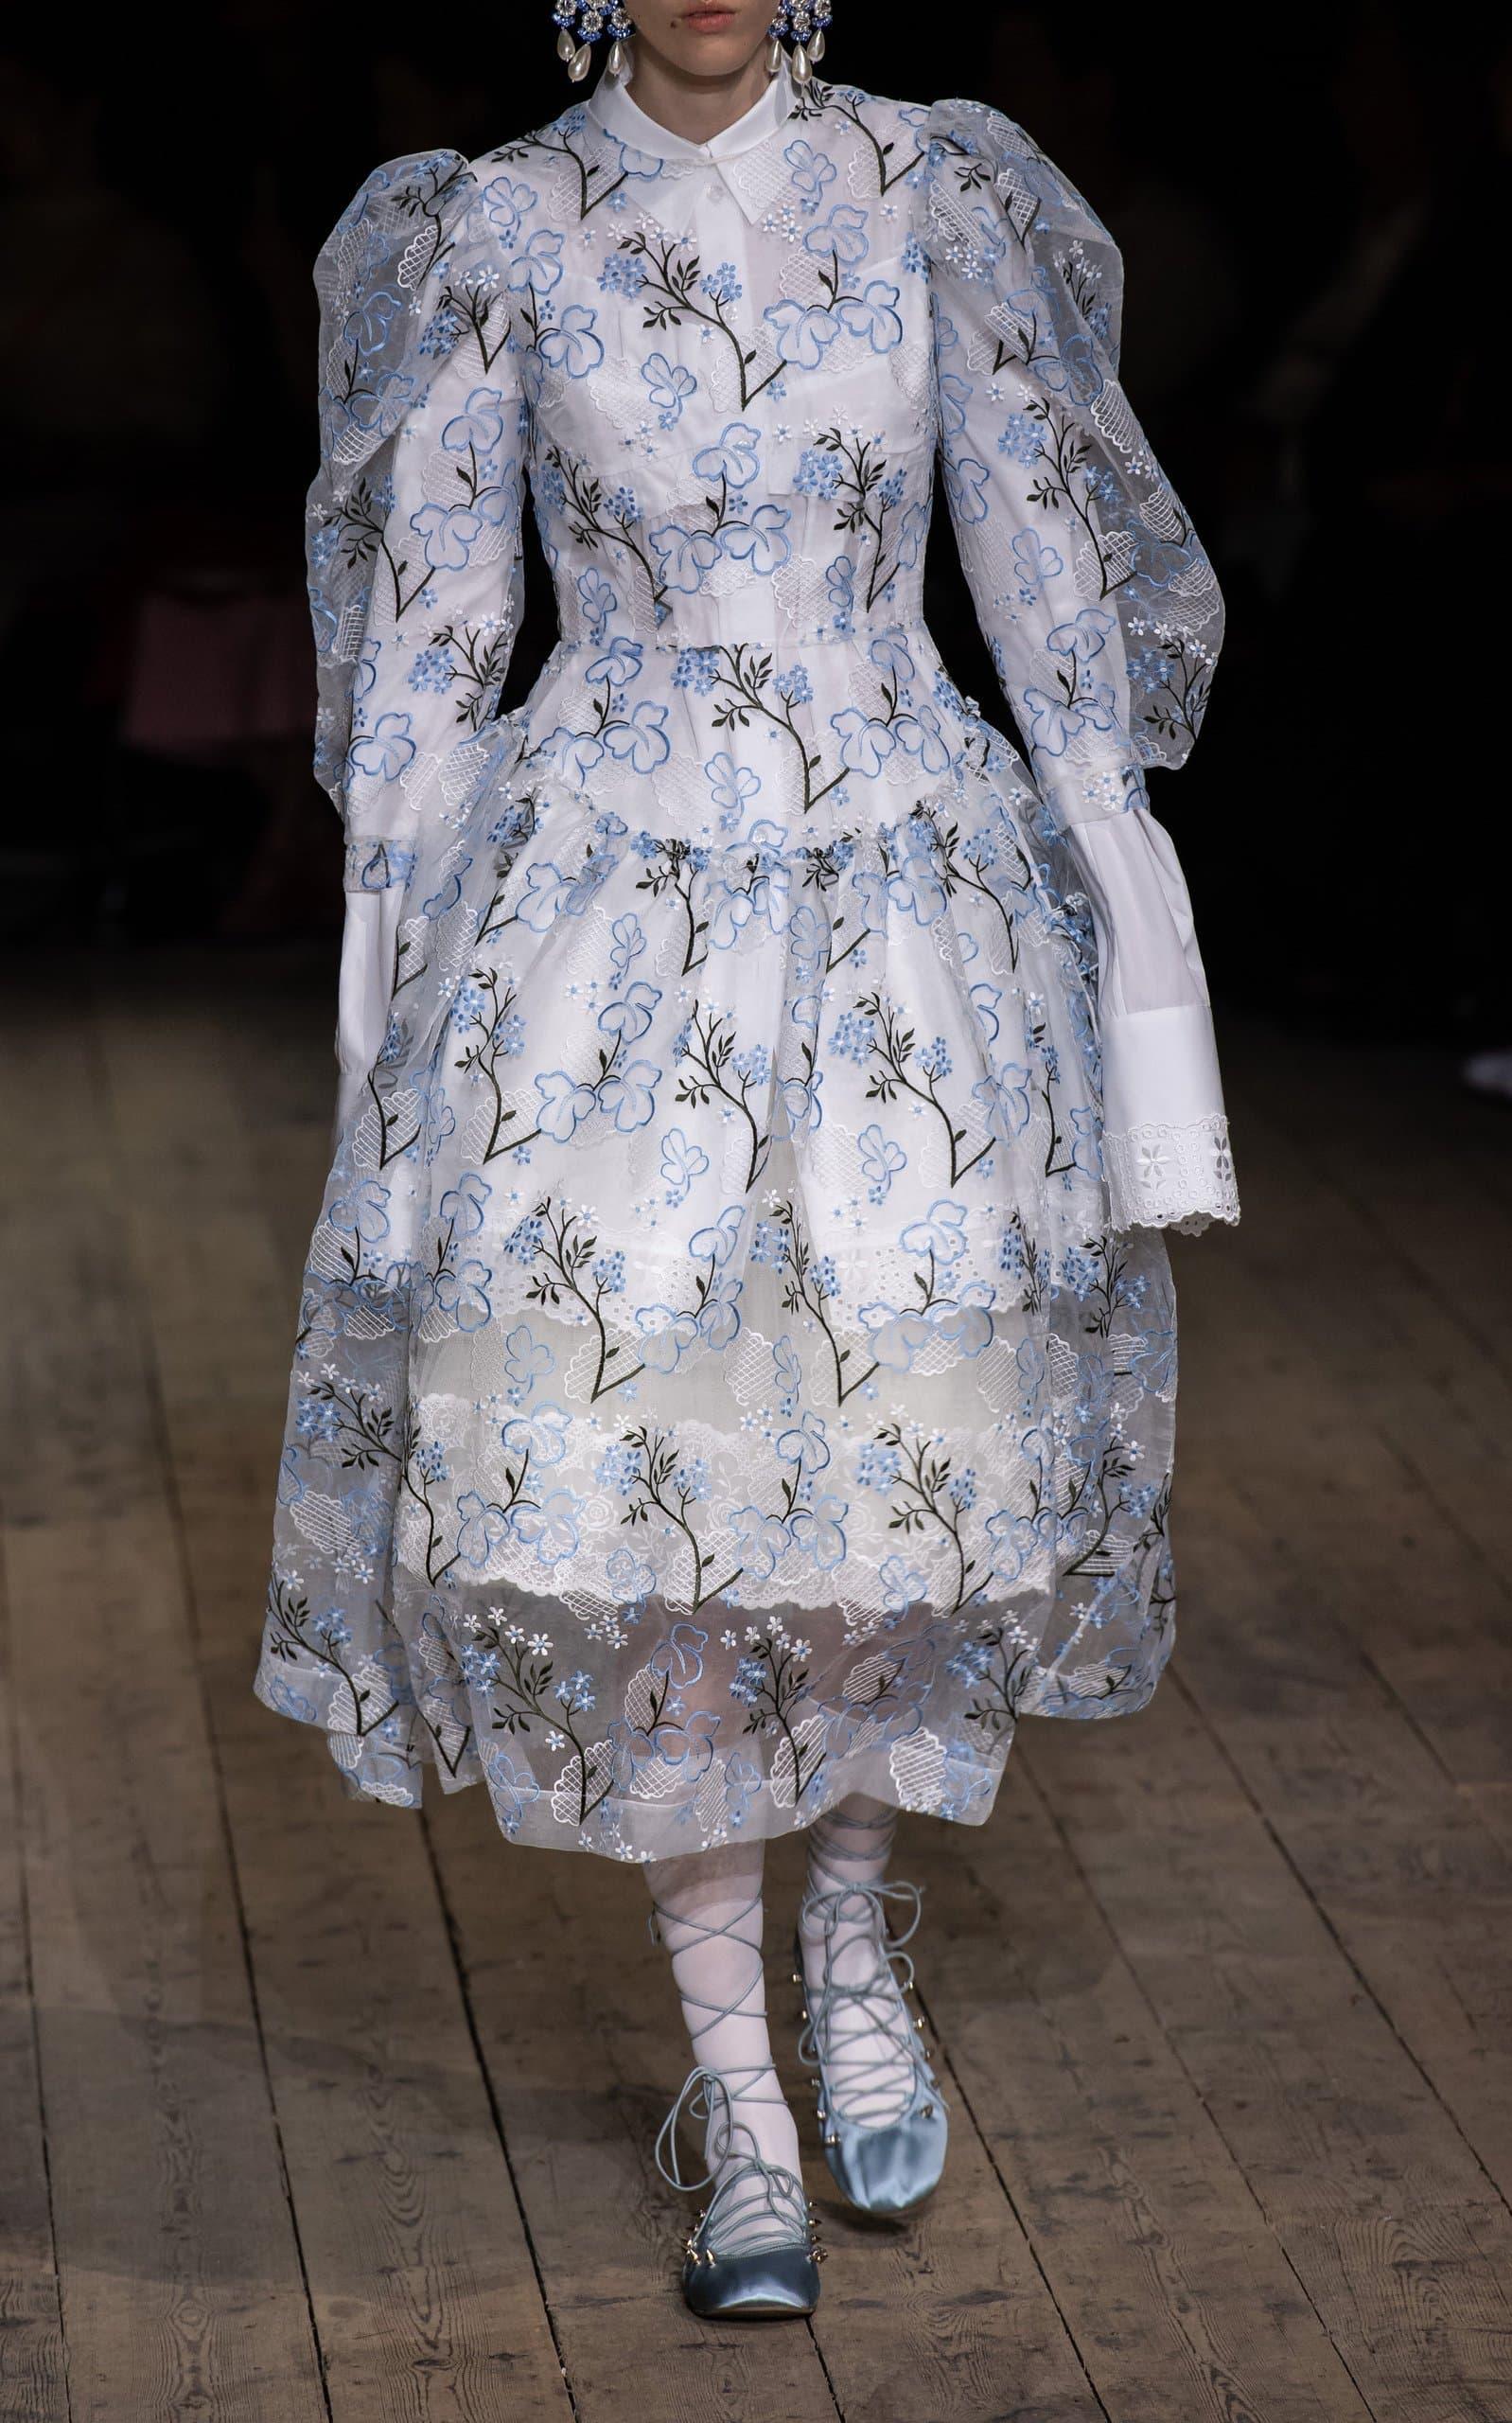 Simone Rocha White and Blue dress